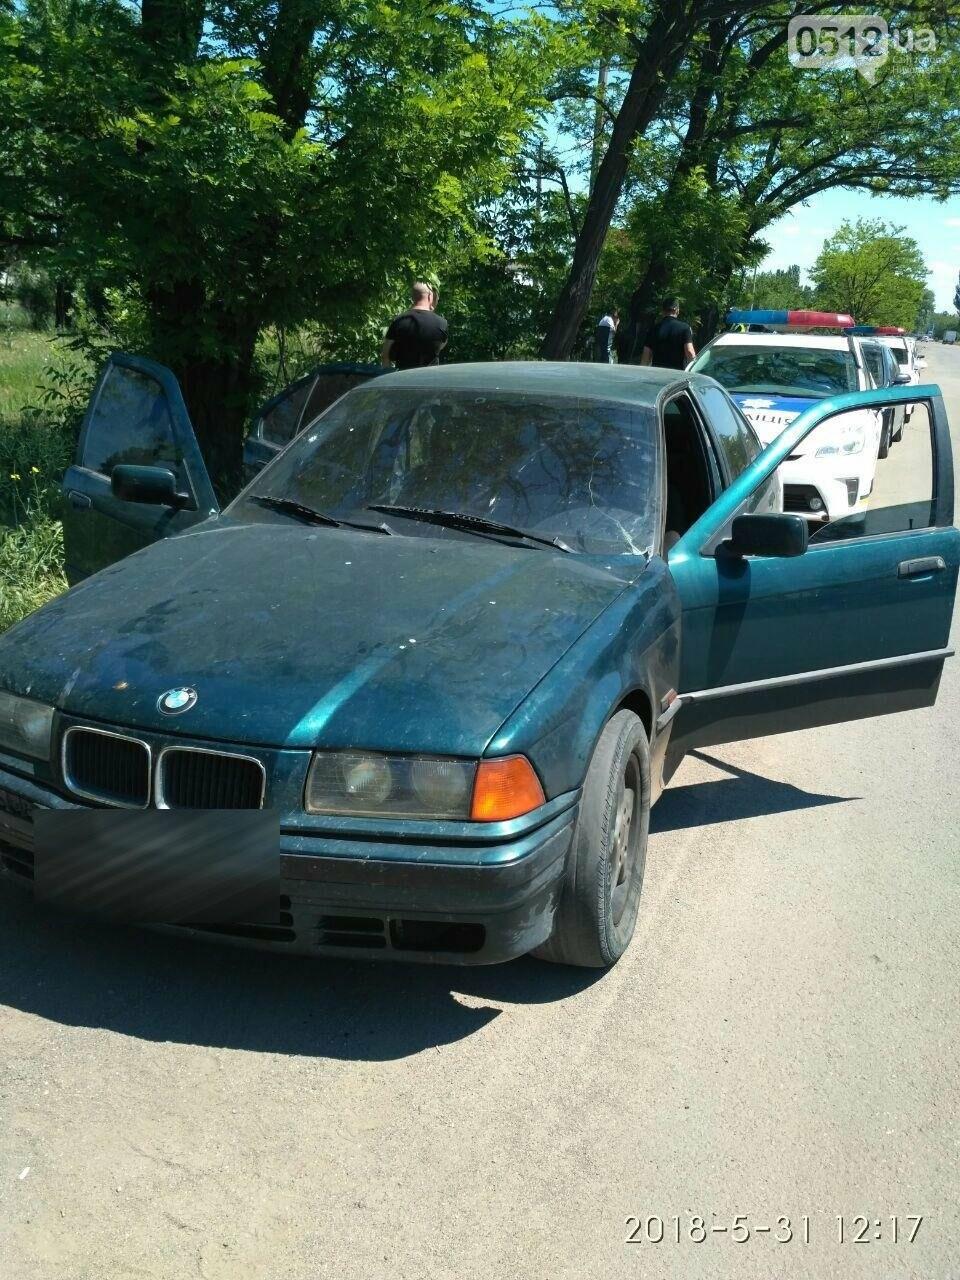 В Николаеве остановили пьяного водителя BMW с ножом, - ФОТО, фото-3